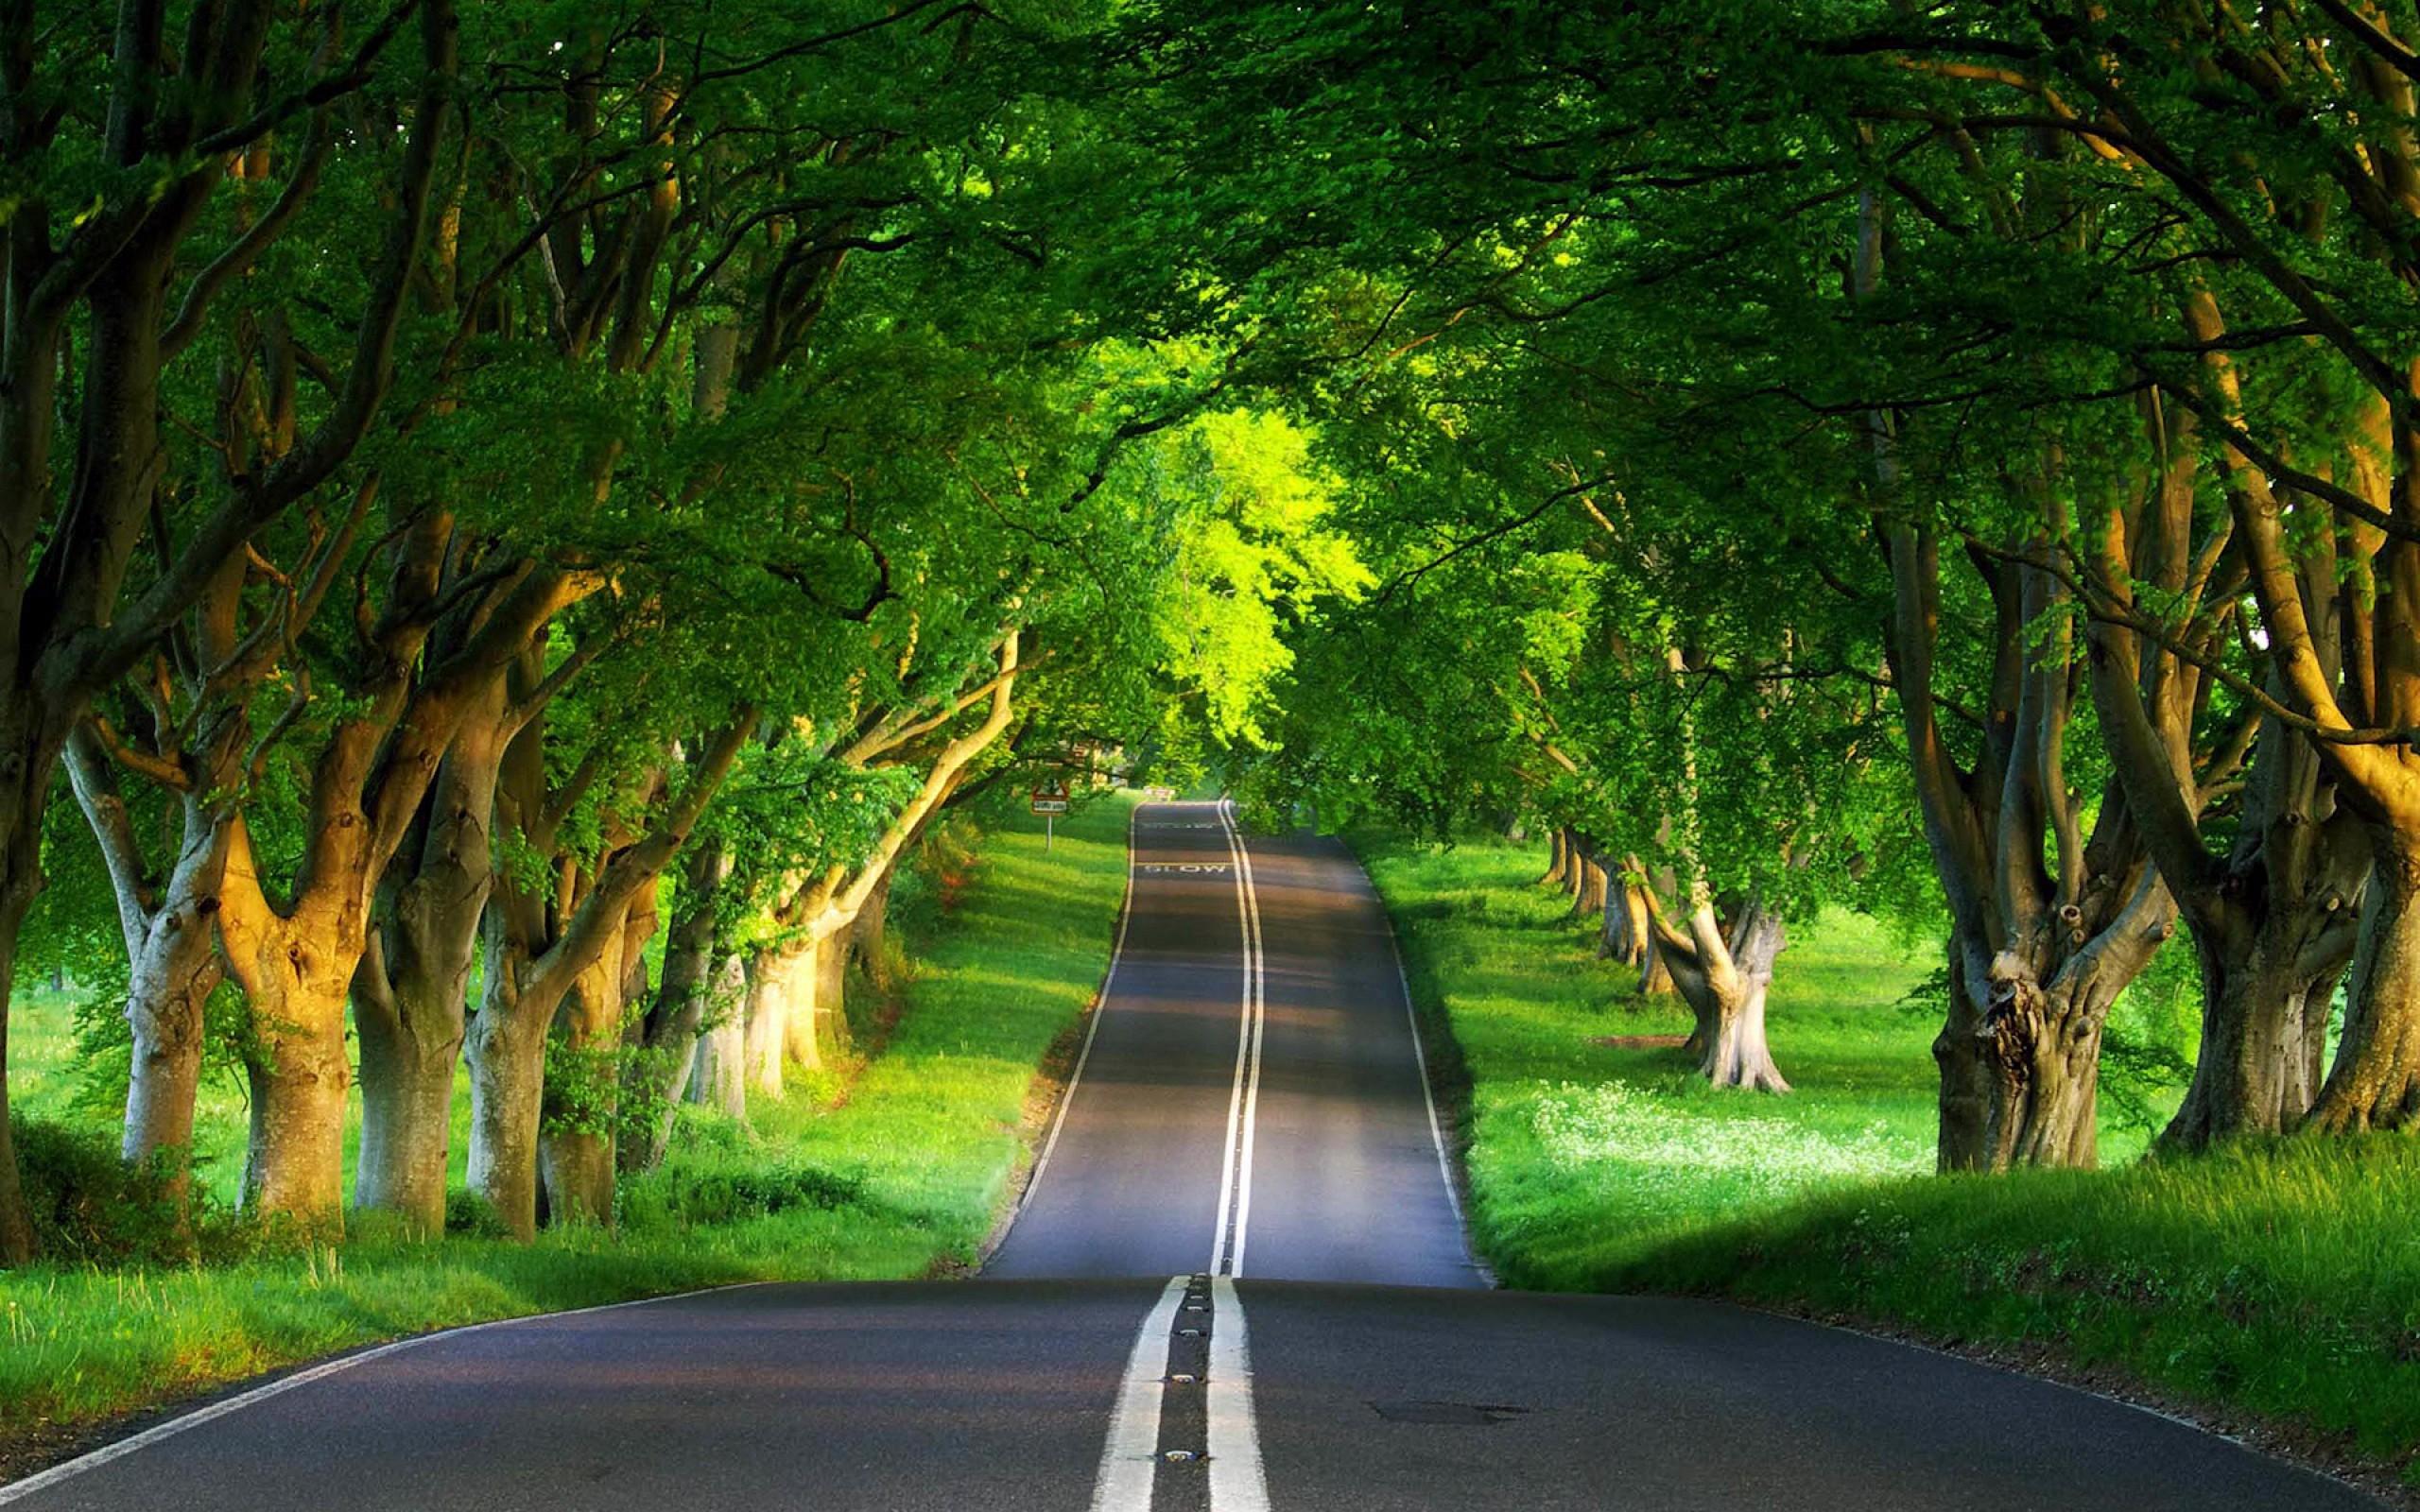 Amazing Road In A Forest Wallpaper Faxo Faxo